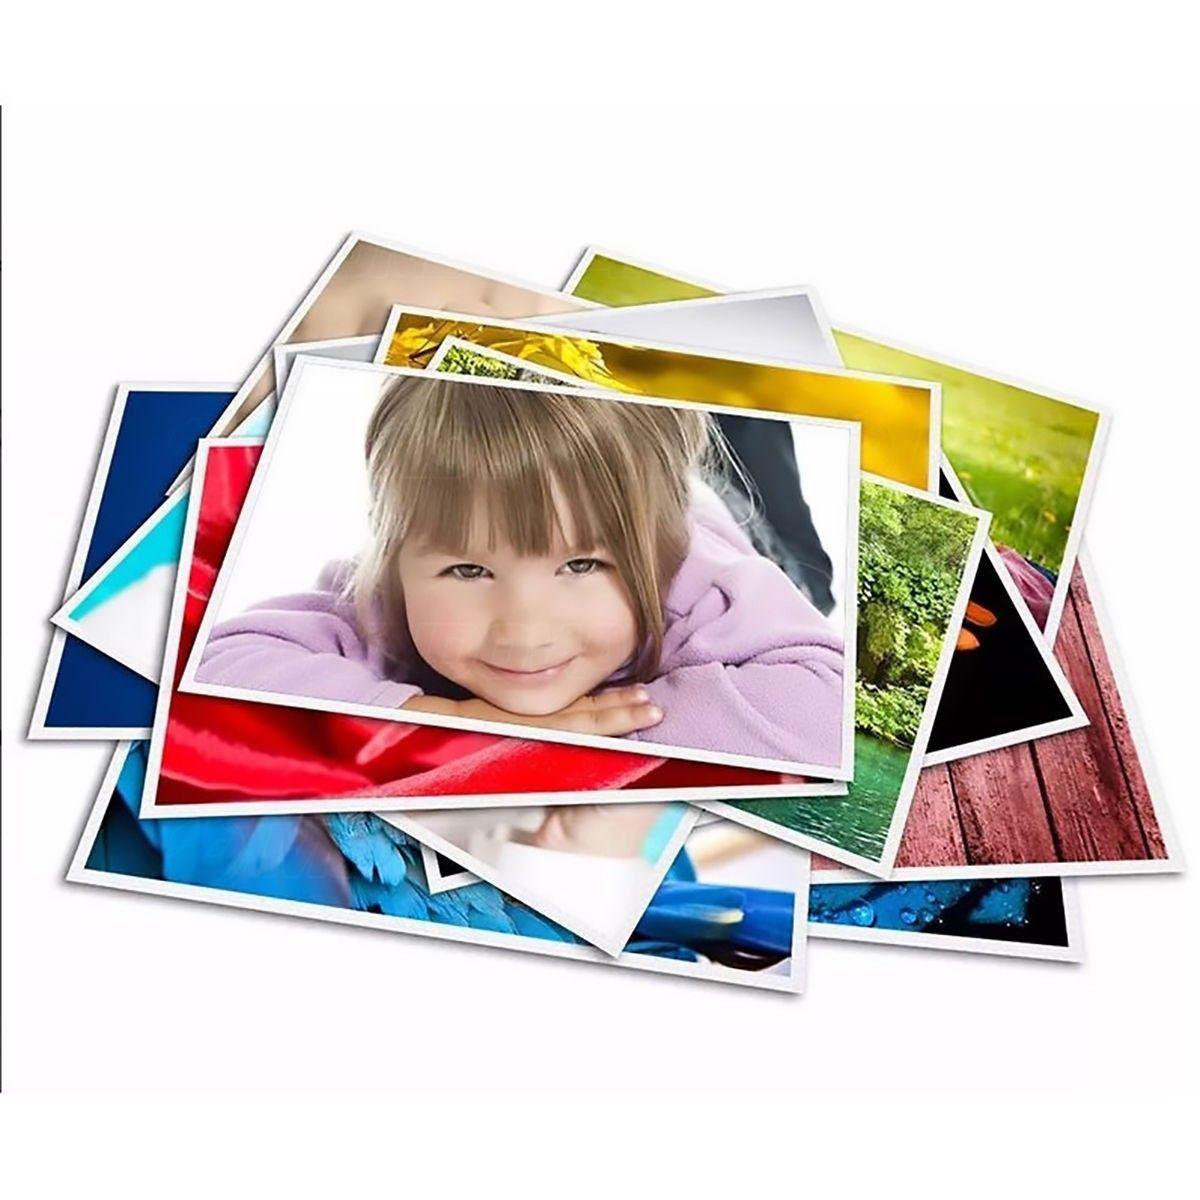 Papel Fotográfico 180g A4  50 Folhas